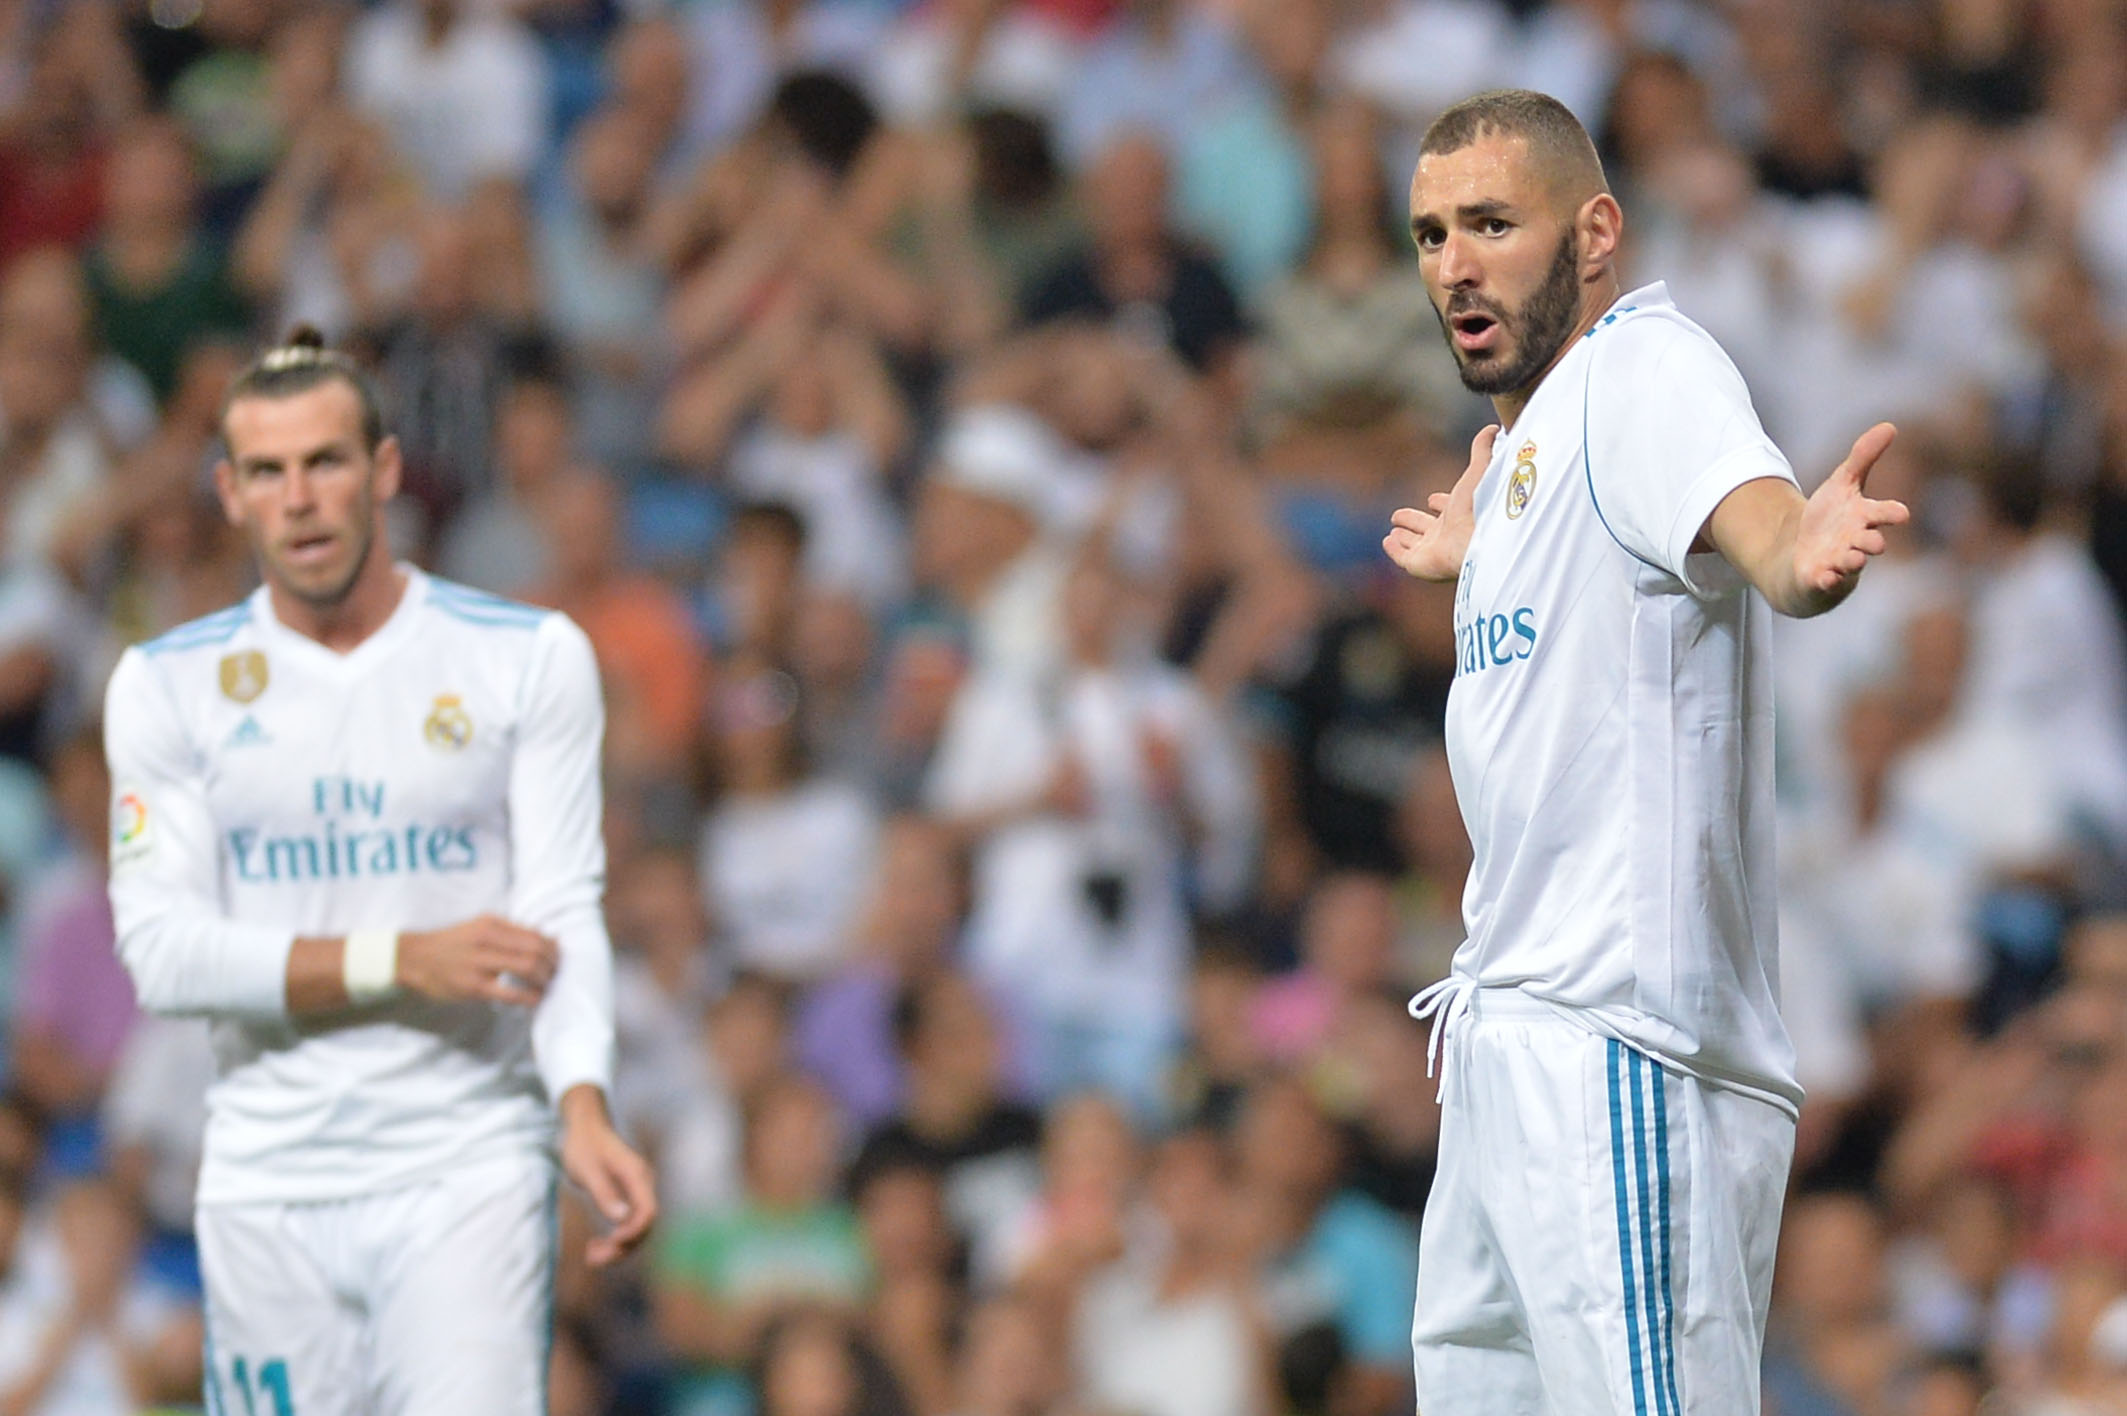 Football - Etranger - Benzema rempile au Real, l'histoire d'amour continue